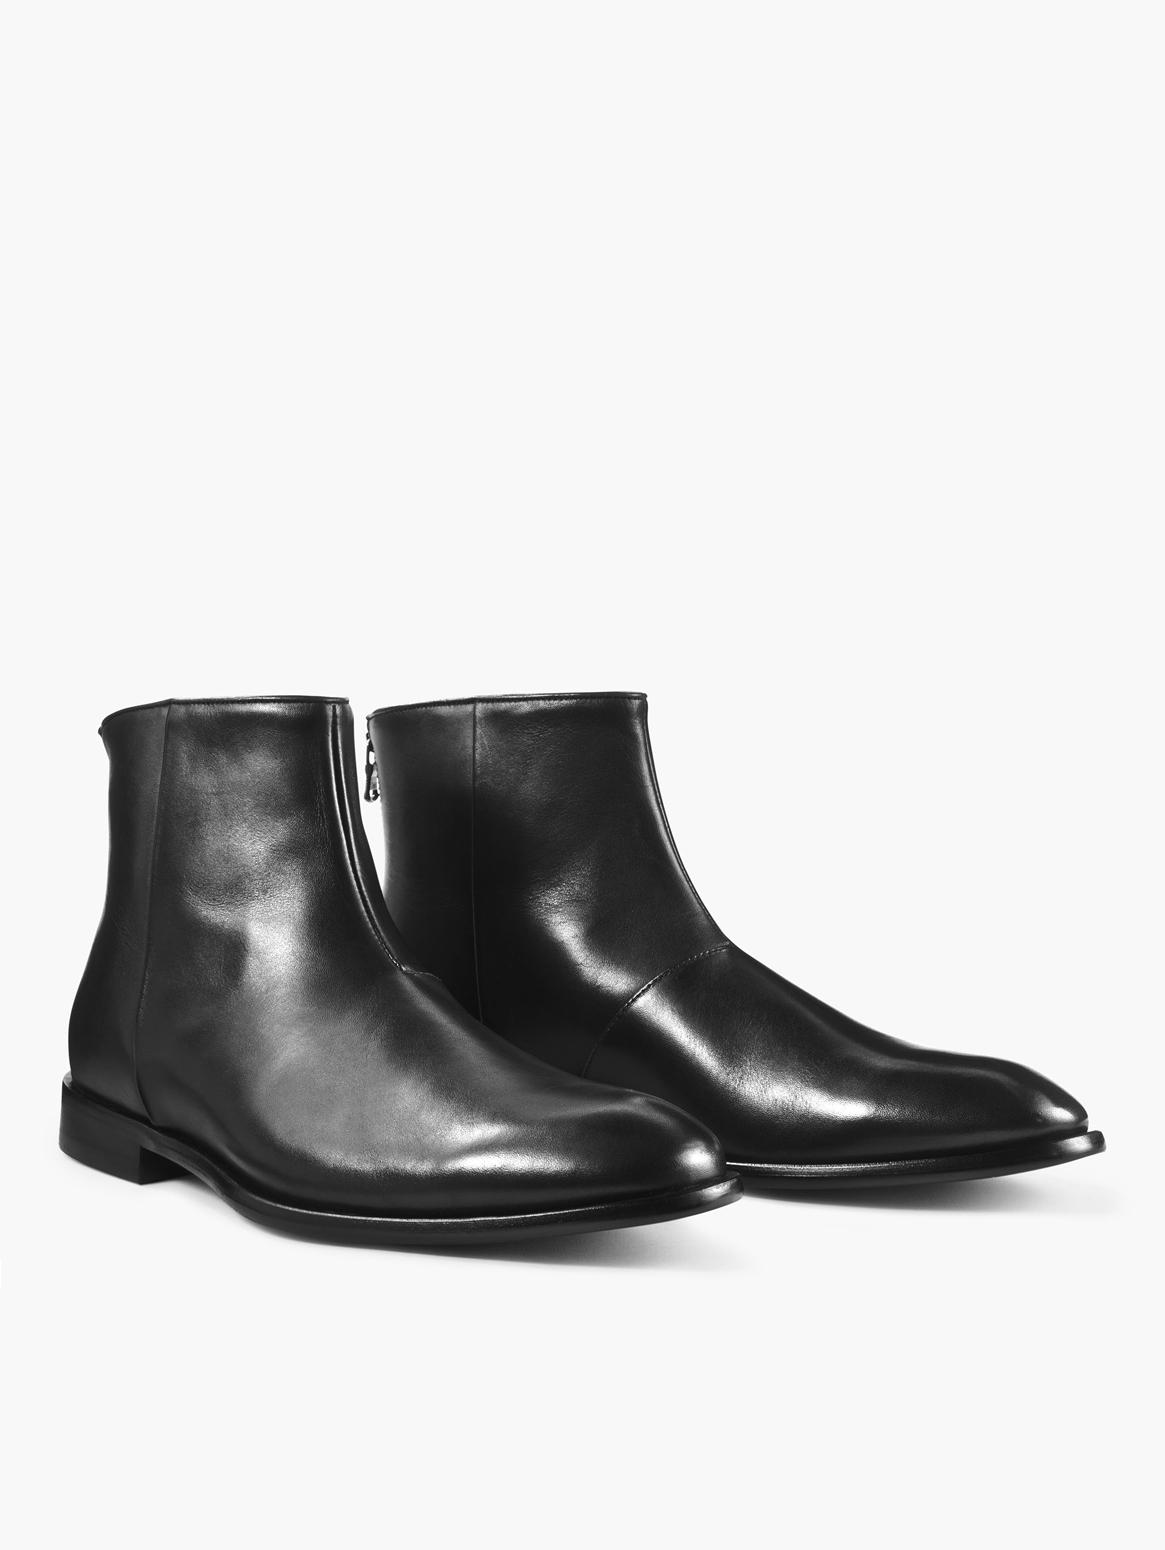 John Varvatos Nyc Back Zip Boot Black